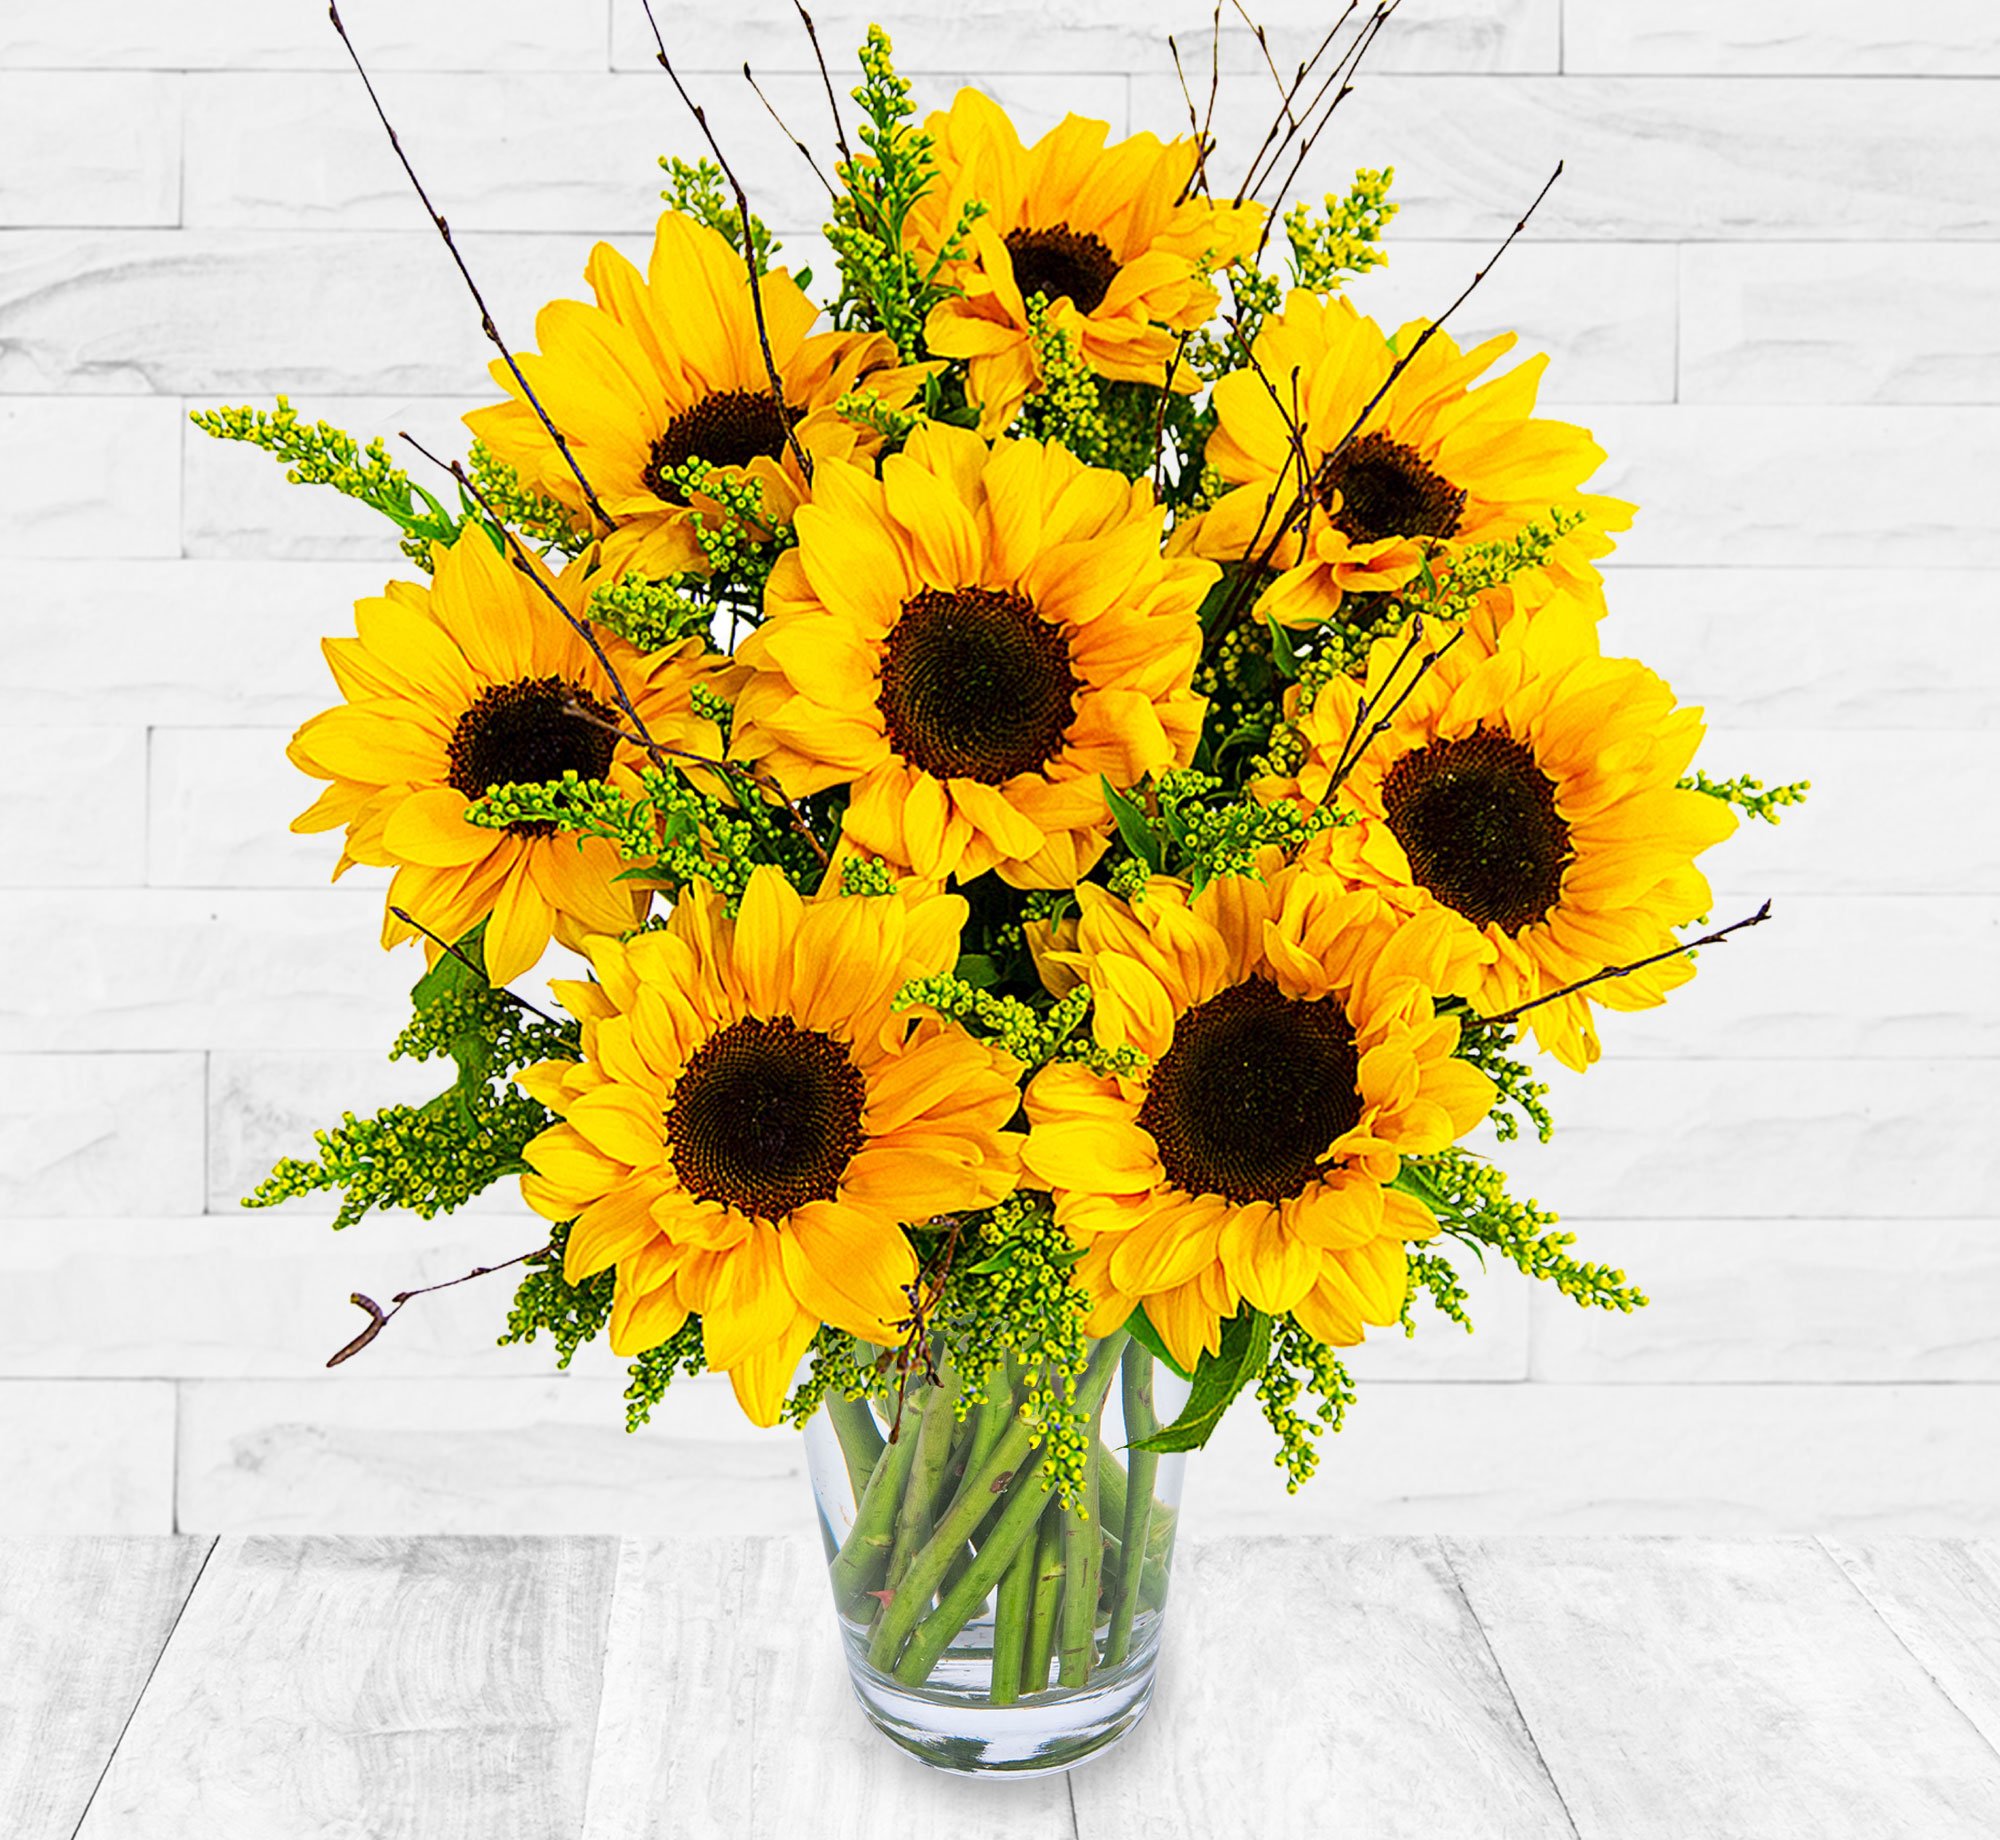 Sunny British Sunflowers